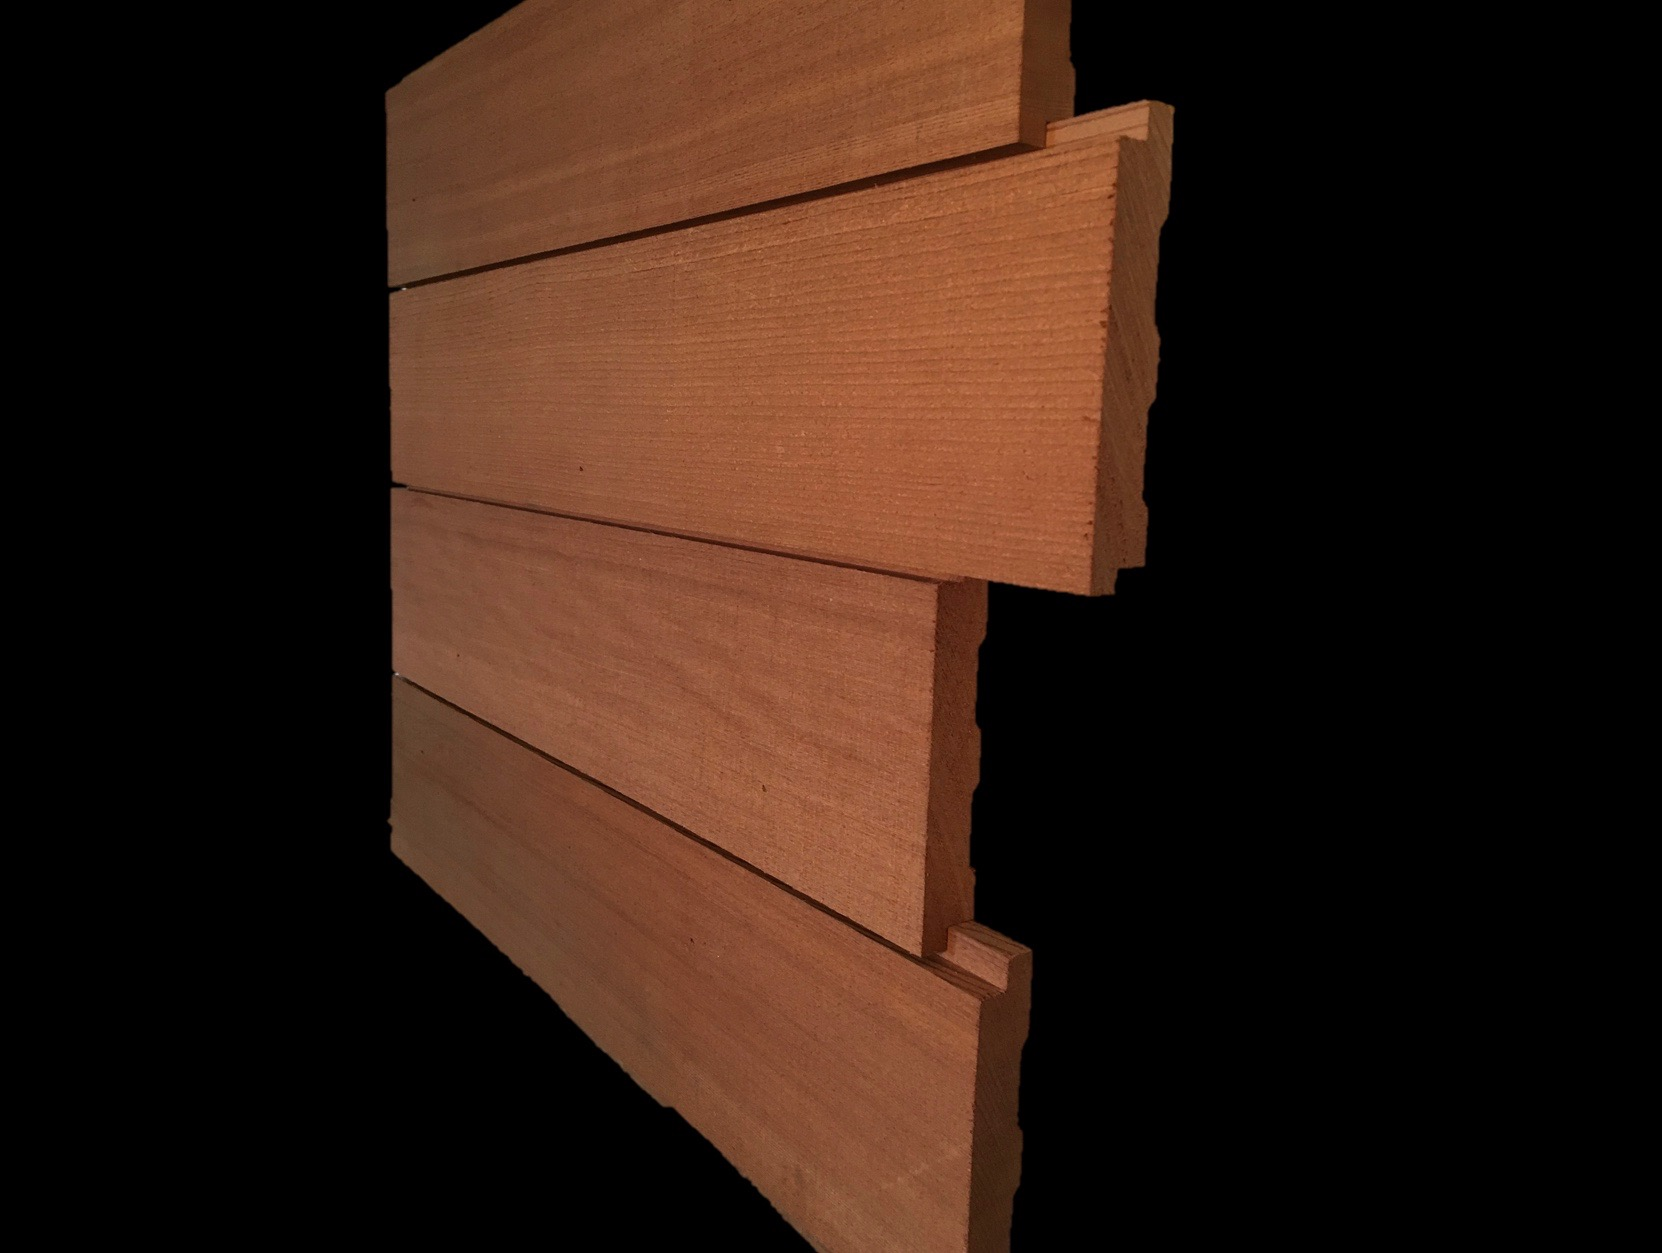 resawn redwood04 - Reclaimed Planking Redwood